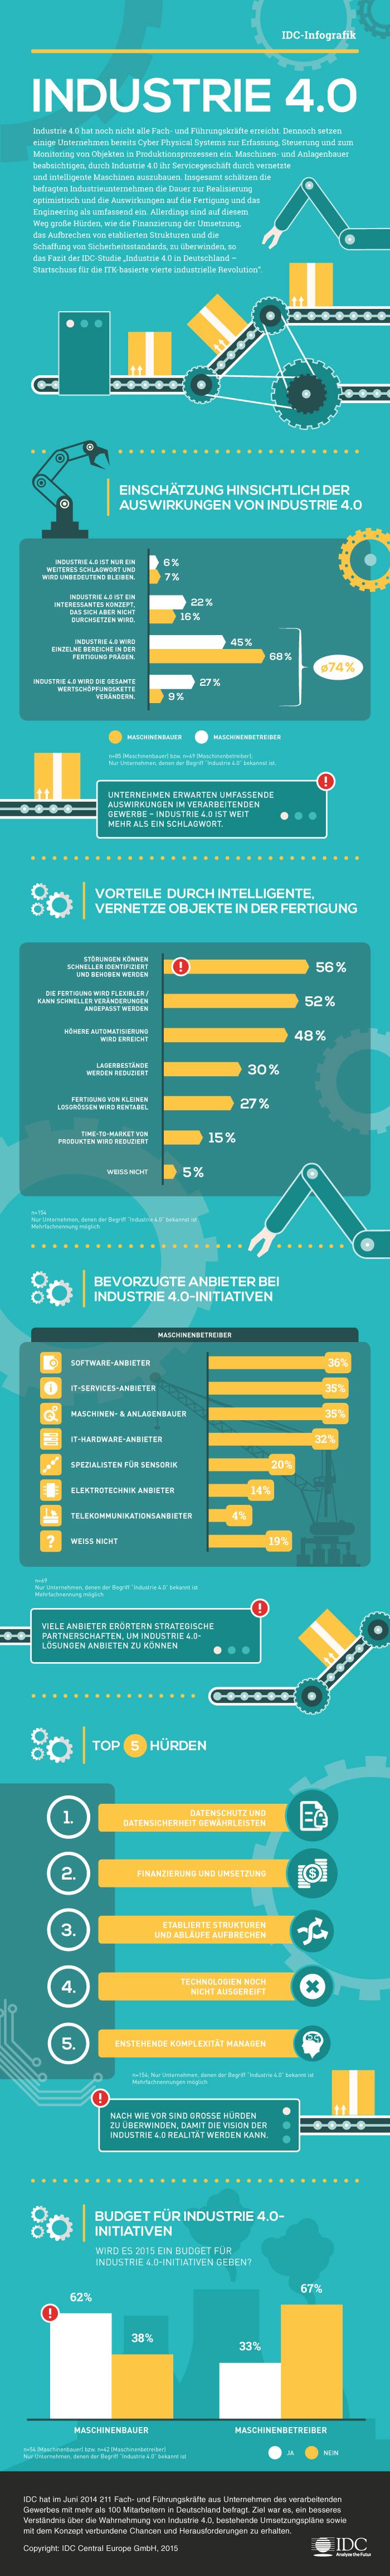 IDC_Infografik_Industrie_4.0-DE_2015